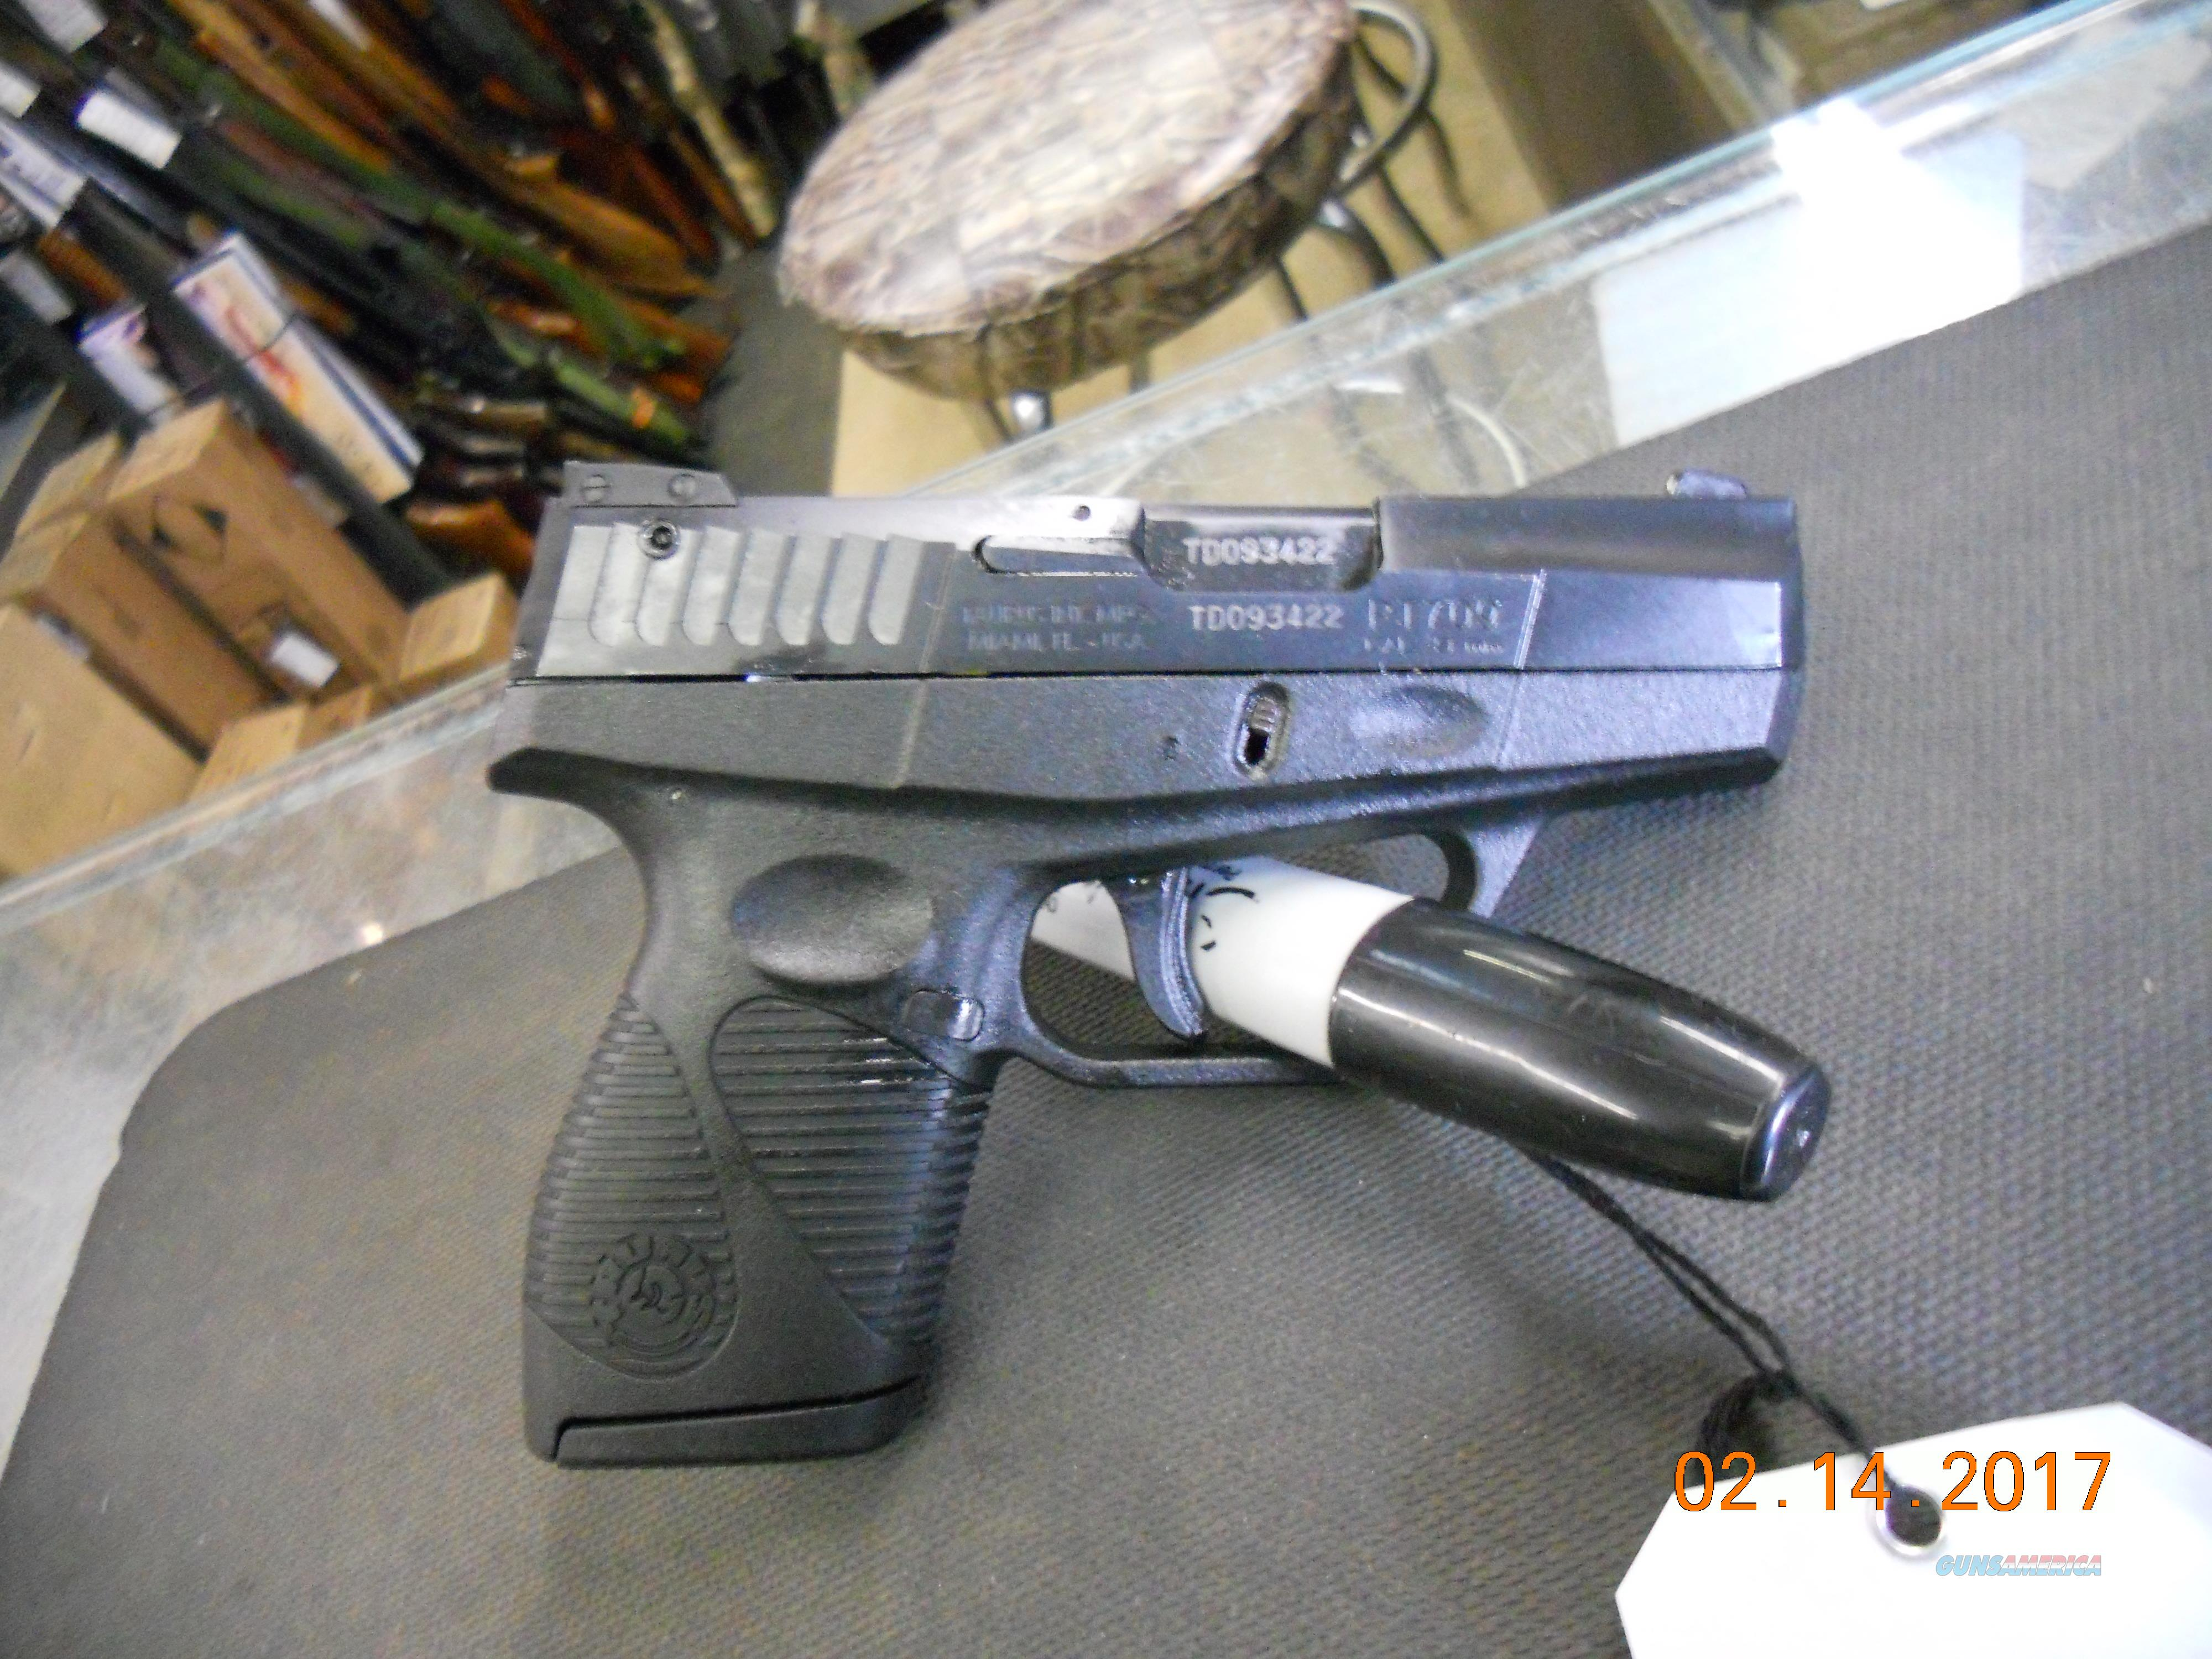 709 slim 9mm pistol -  Userimages 141323 993671444 9754867 Jpg Description This Is A Taurus 709 Slim 9mm